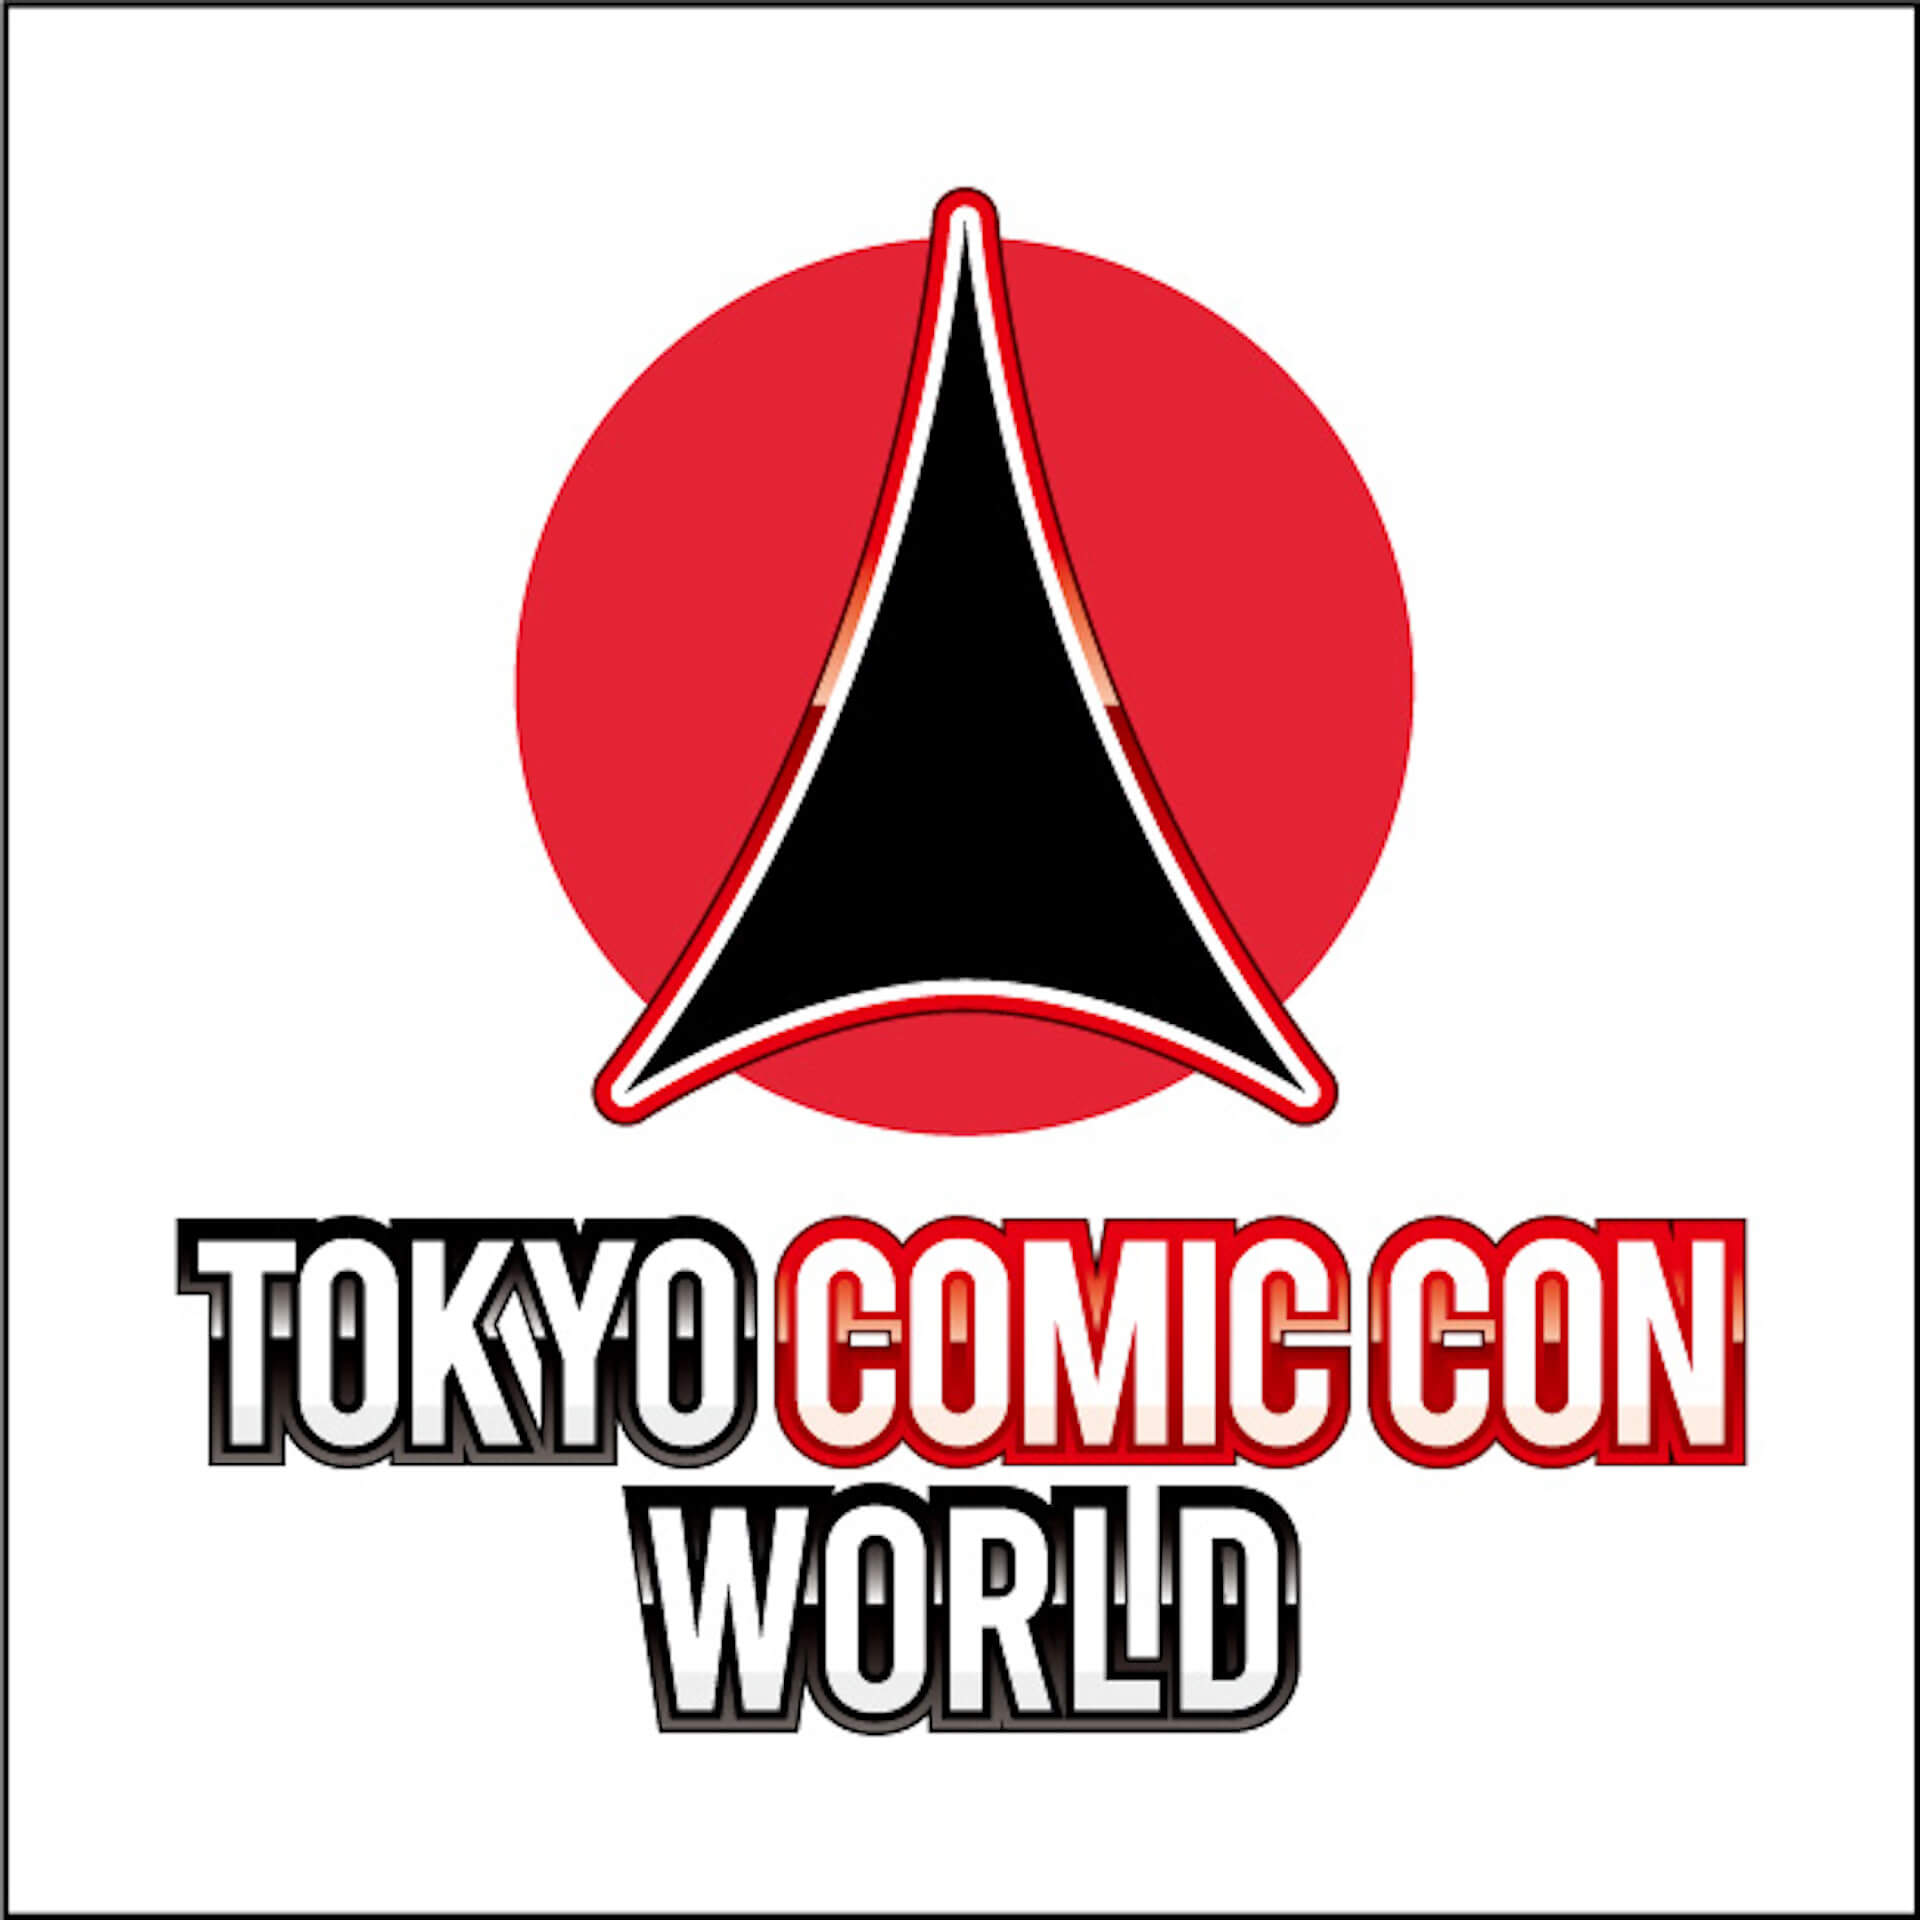 『BTTF』のメンバーが東京コミコン2020に勢ぞろい!クリストファー・ロイド、リー・トンプソン、トム・ウィルソンが参加決定 film201009_comicon_1